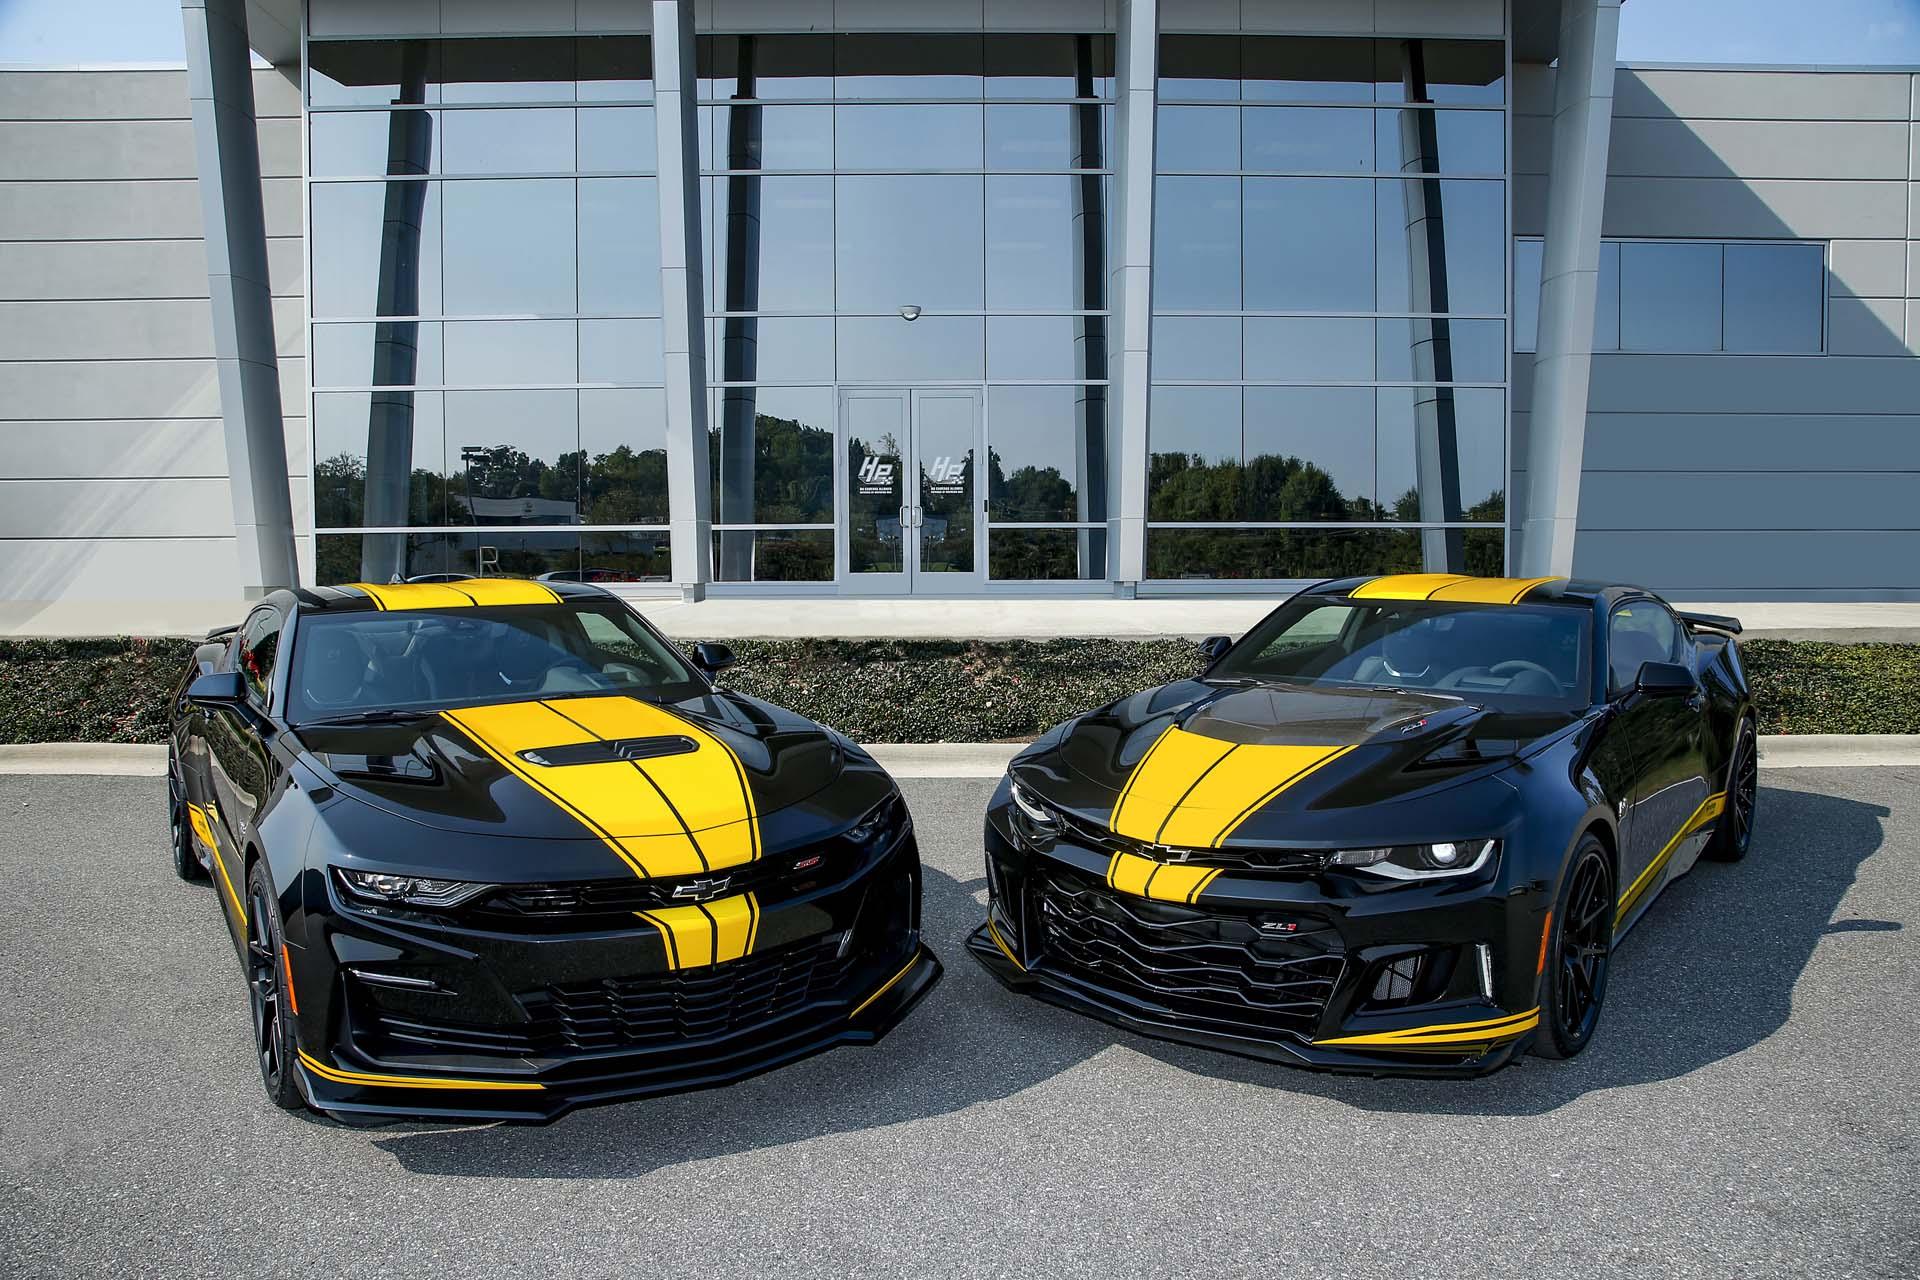 Kelebihan Kekurangan Chevrolet Camaro Zl1 Top Model Tahun Ini